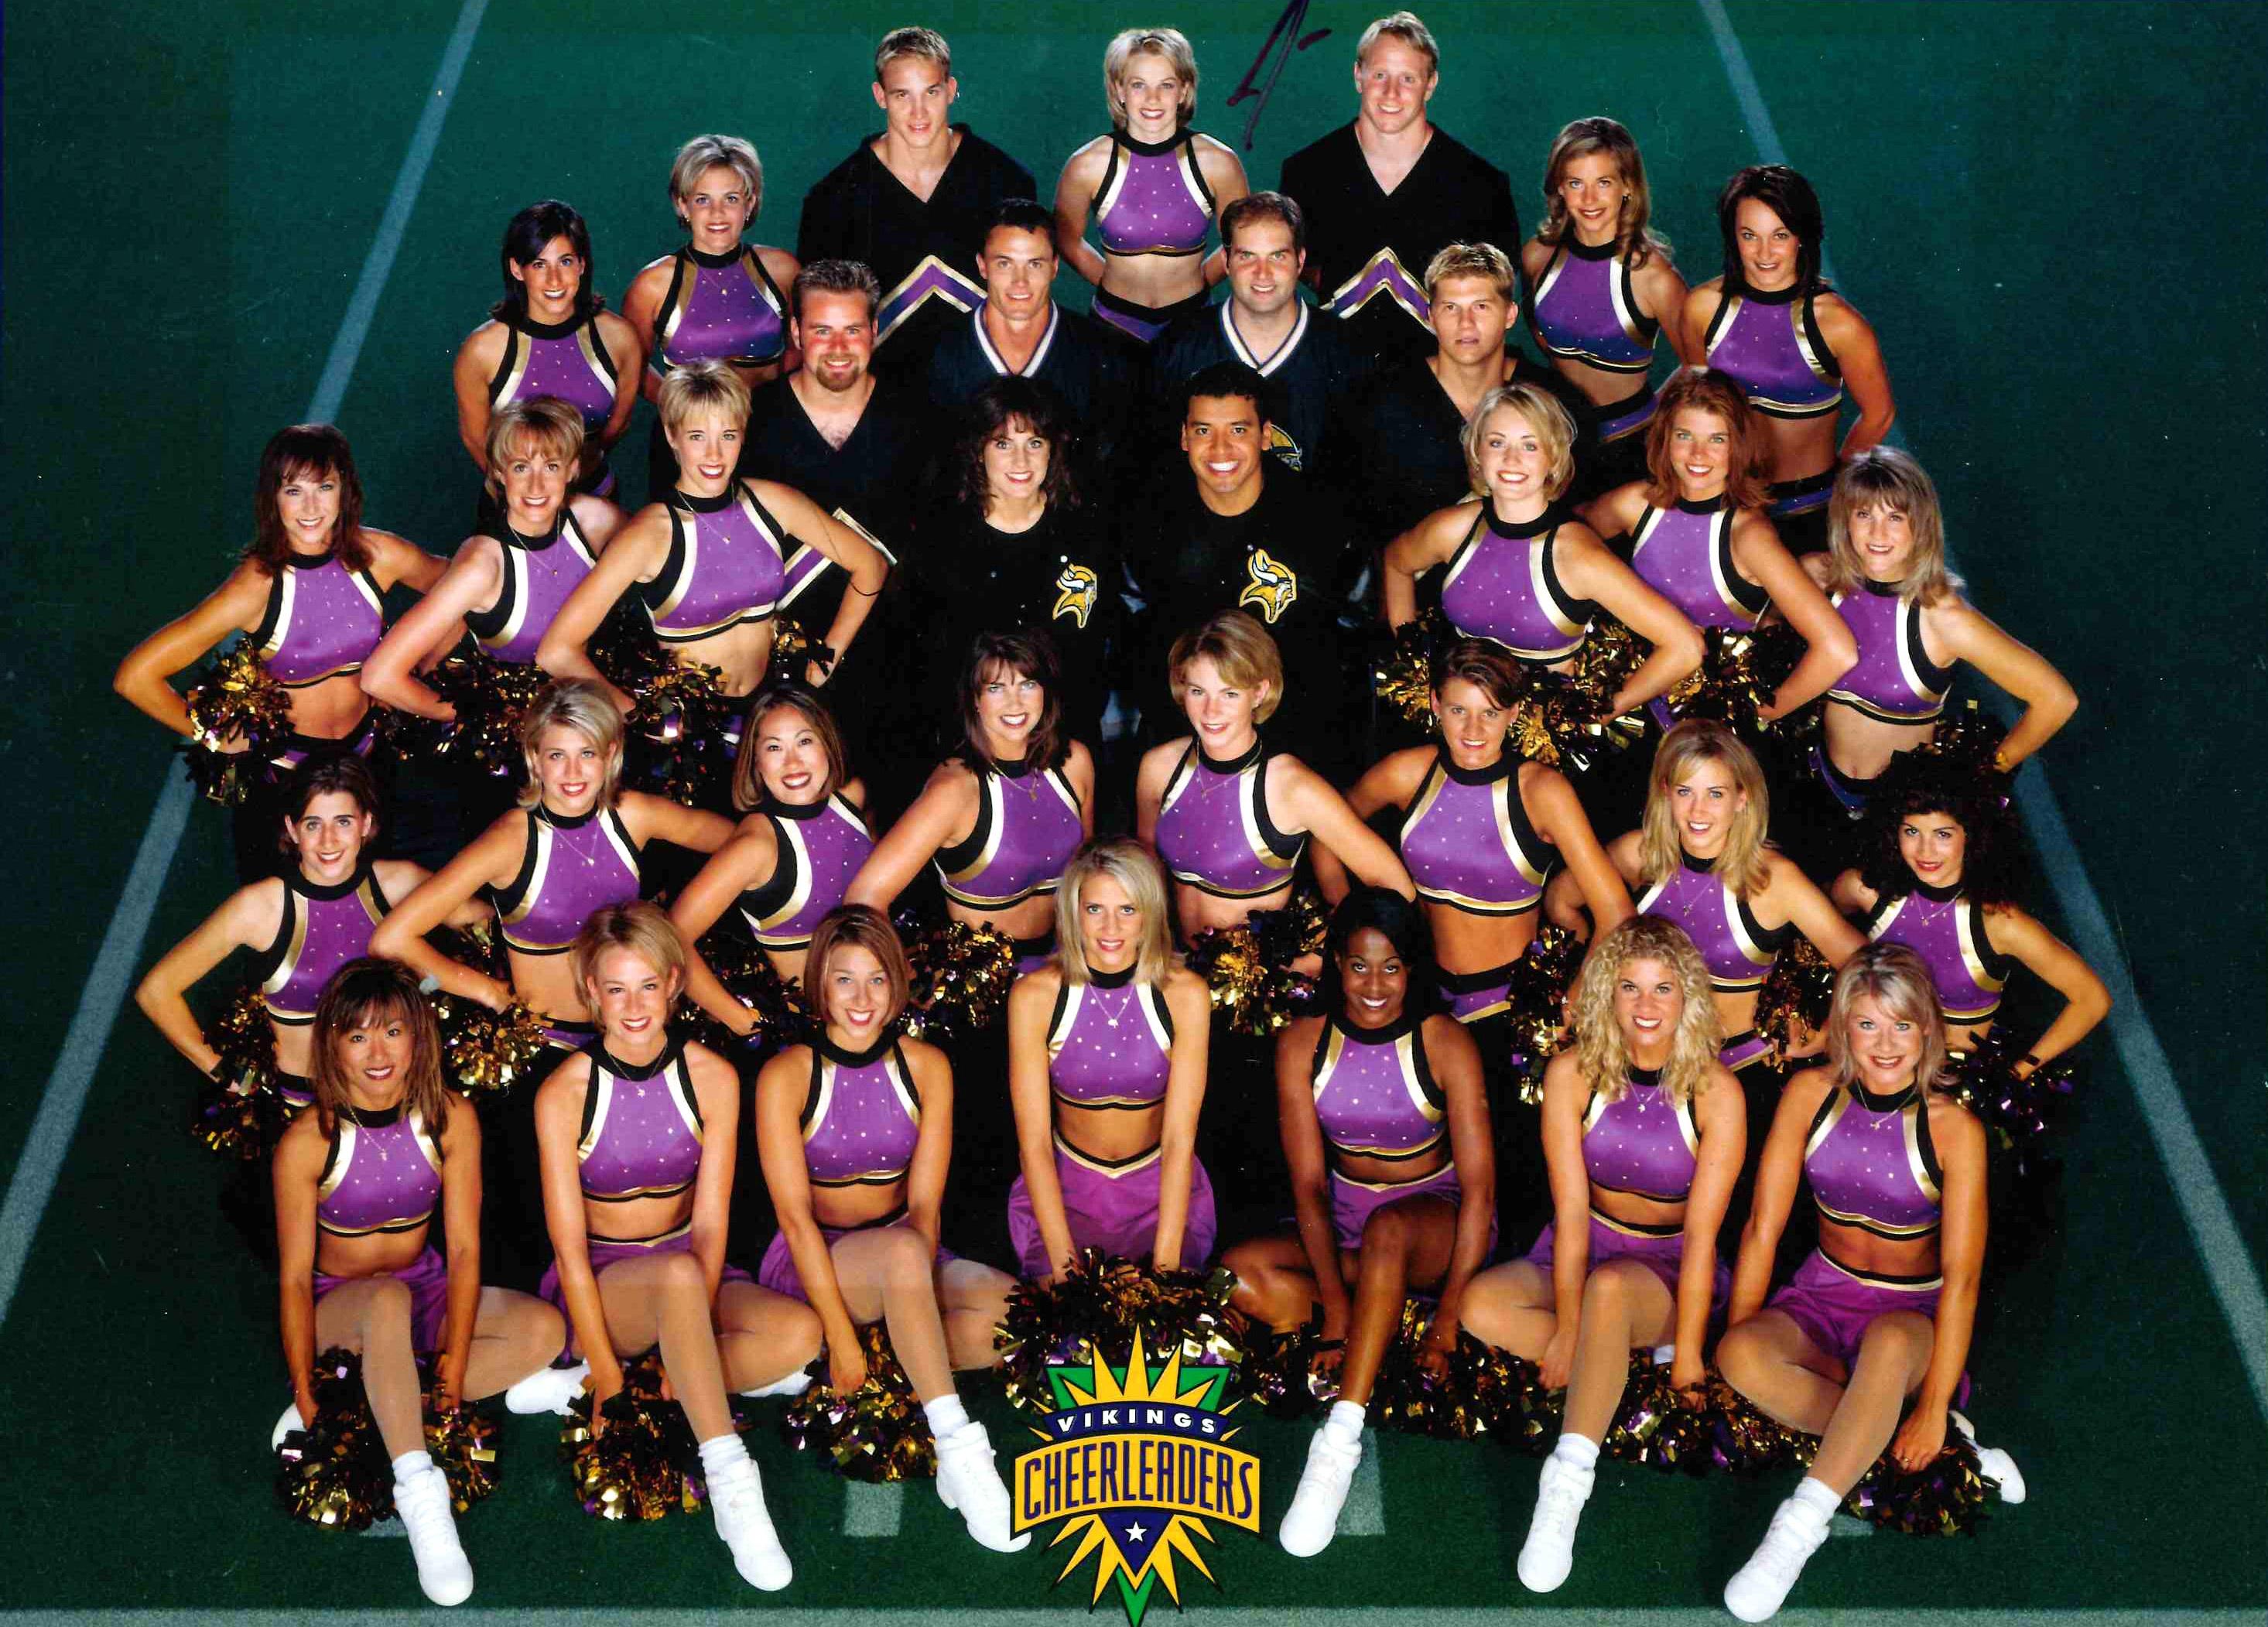 minnesota vikings cheerleaders vintage uniforms